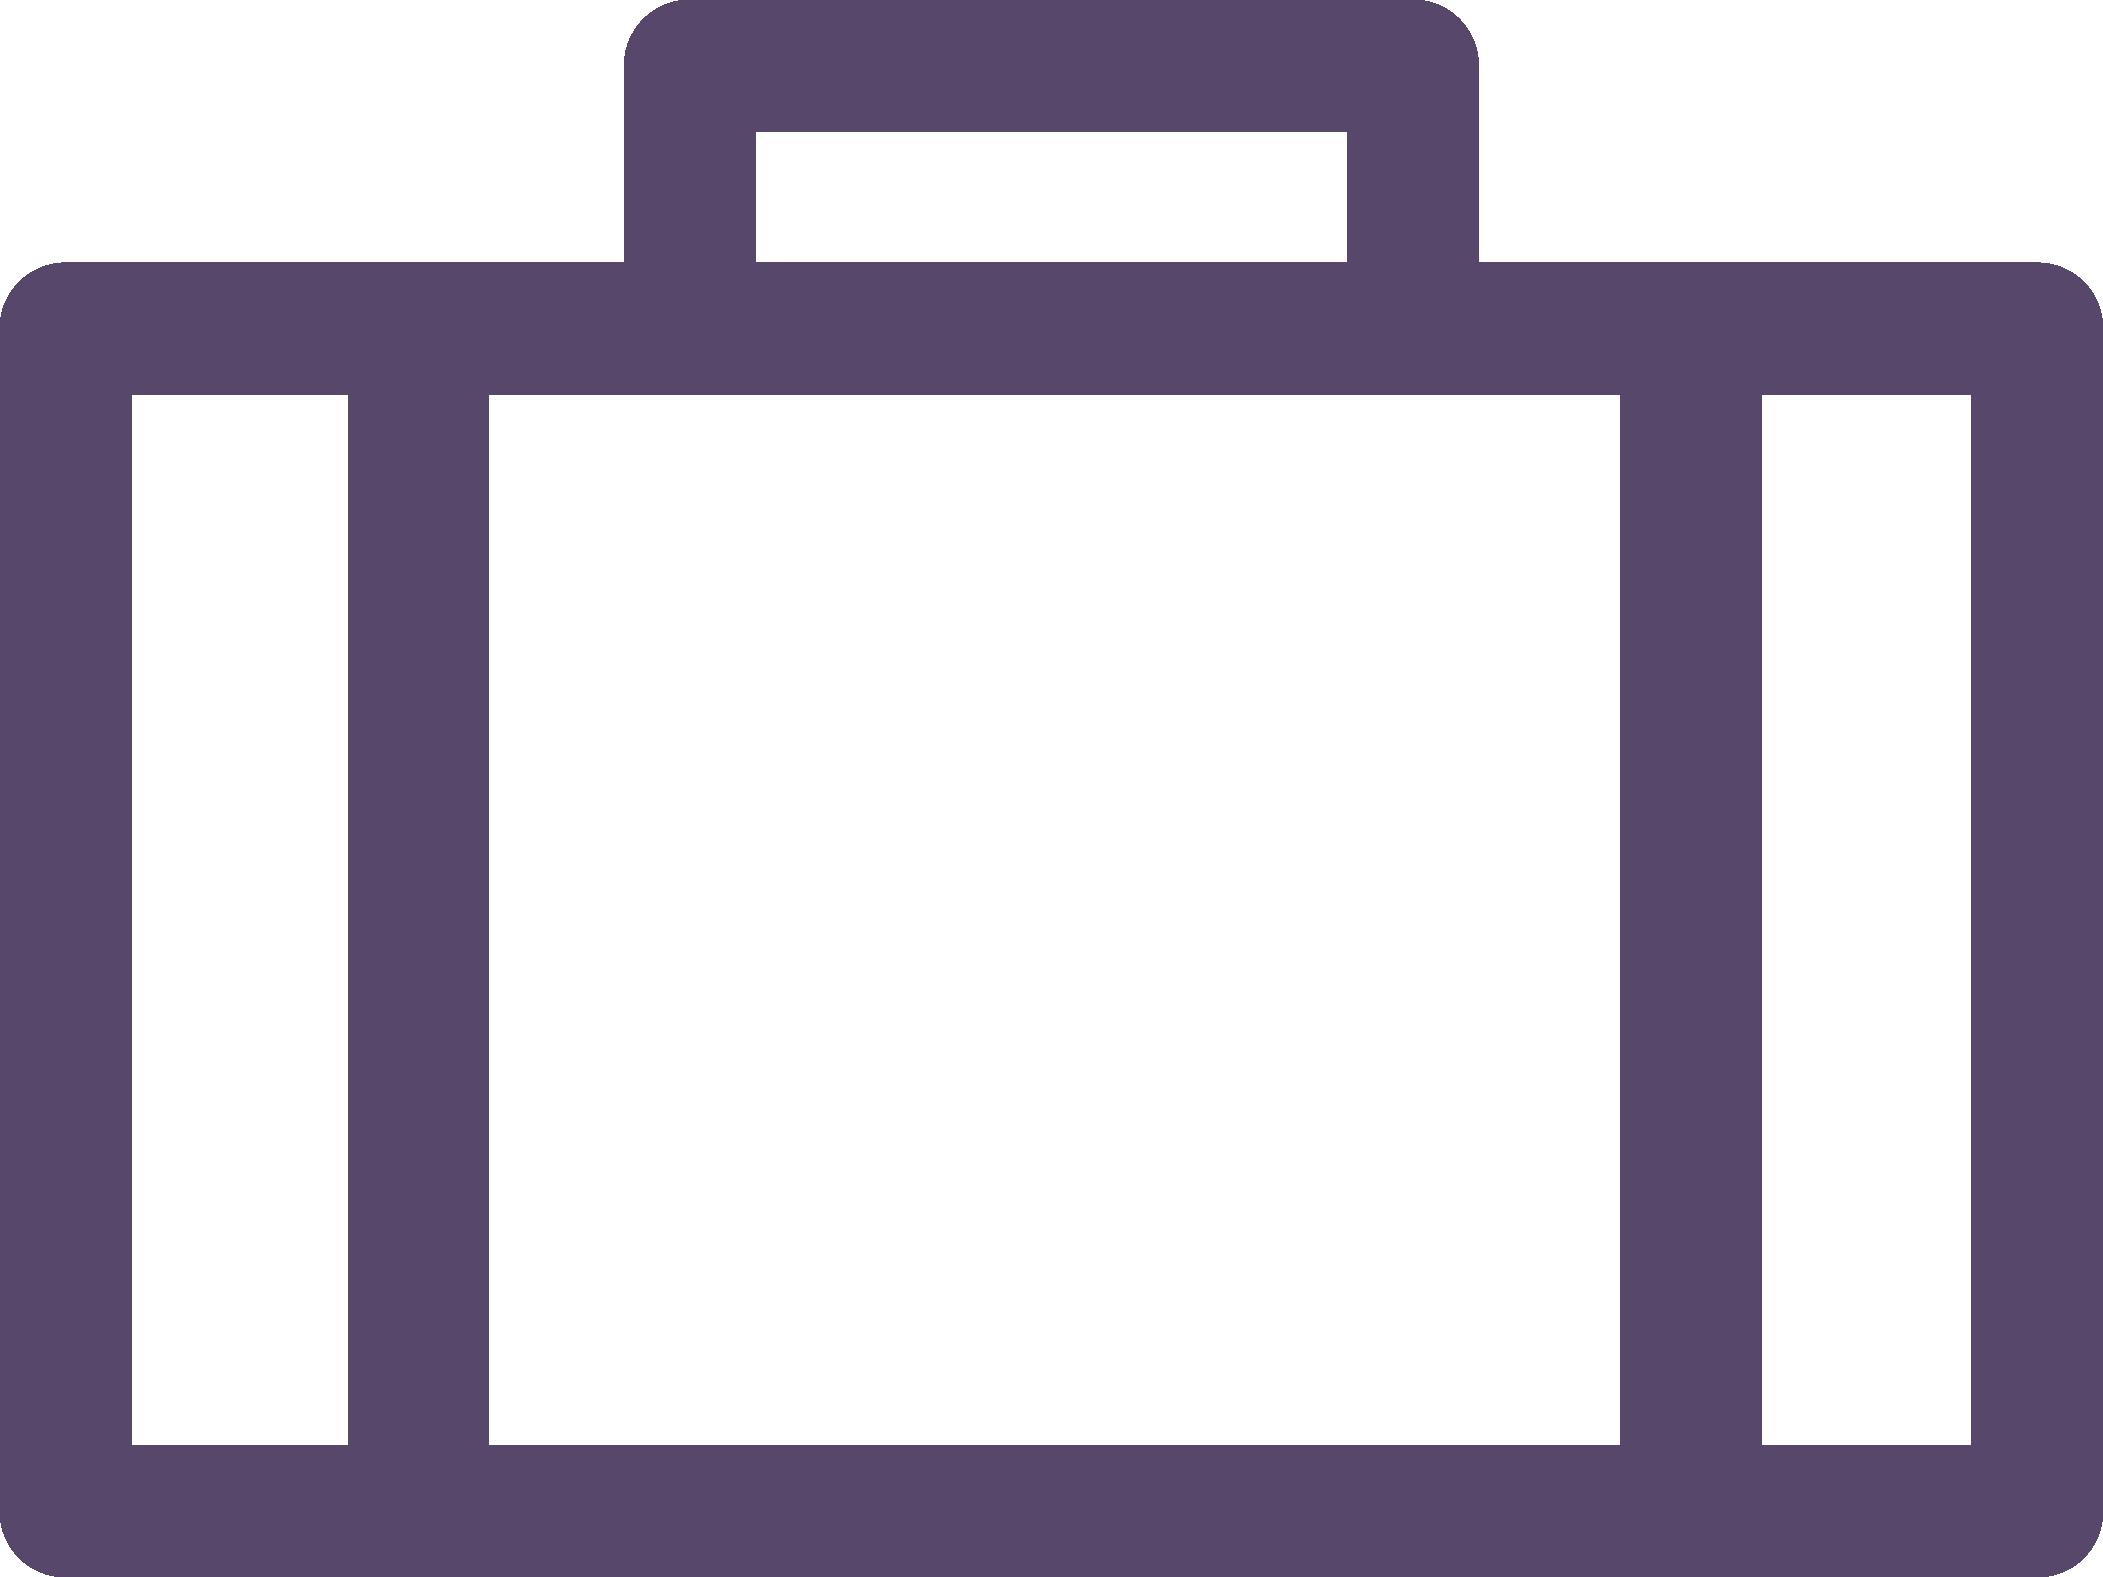 Clipboard clipart purple. Citizens advice southwark annual